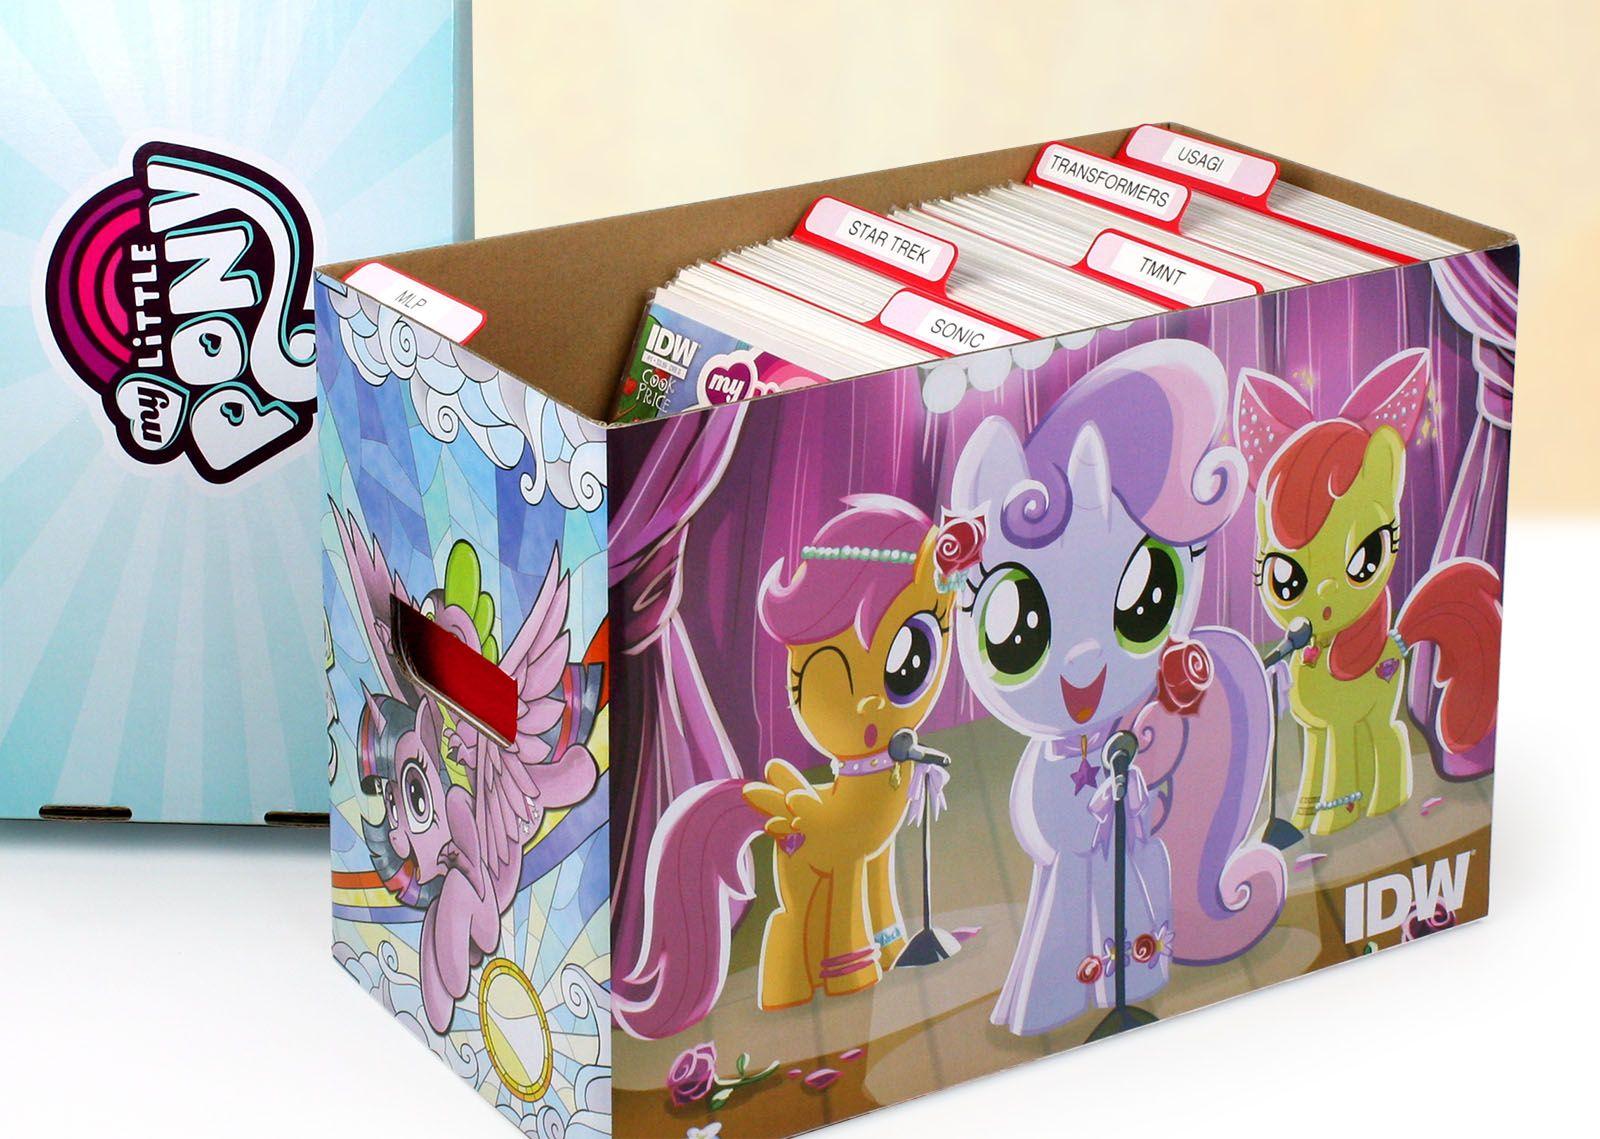 10 BCW Short Comic Book Boxes Pink Geek Art Cardboard Storage 150-175 Comics